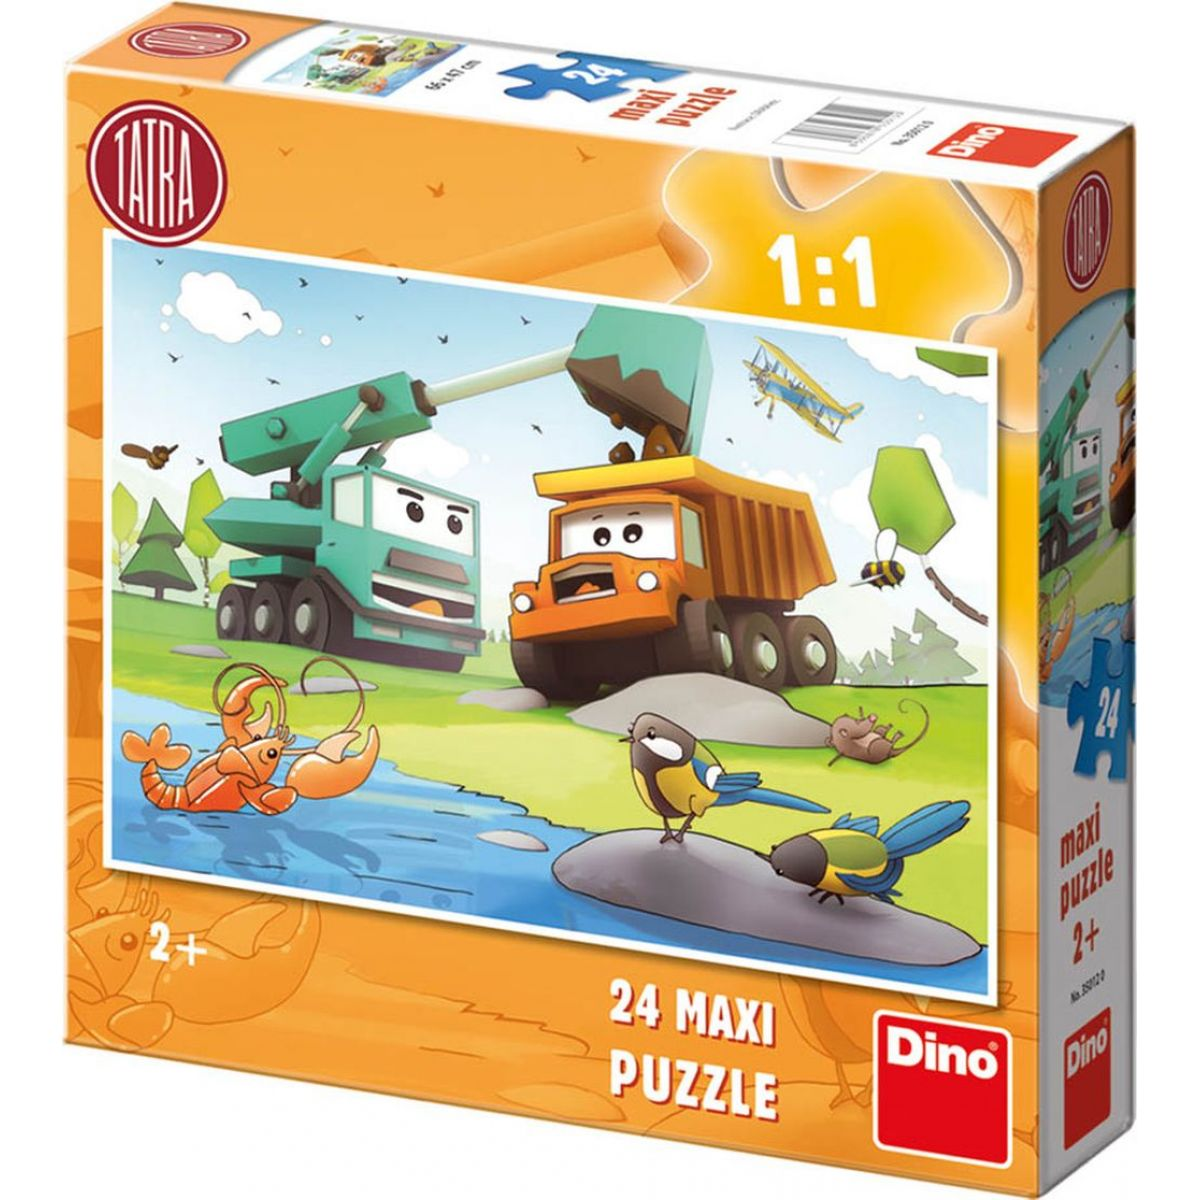 Dino Puzzle Tatra 24 Maxi dílků